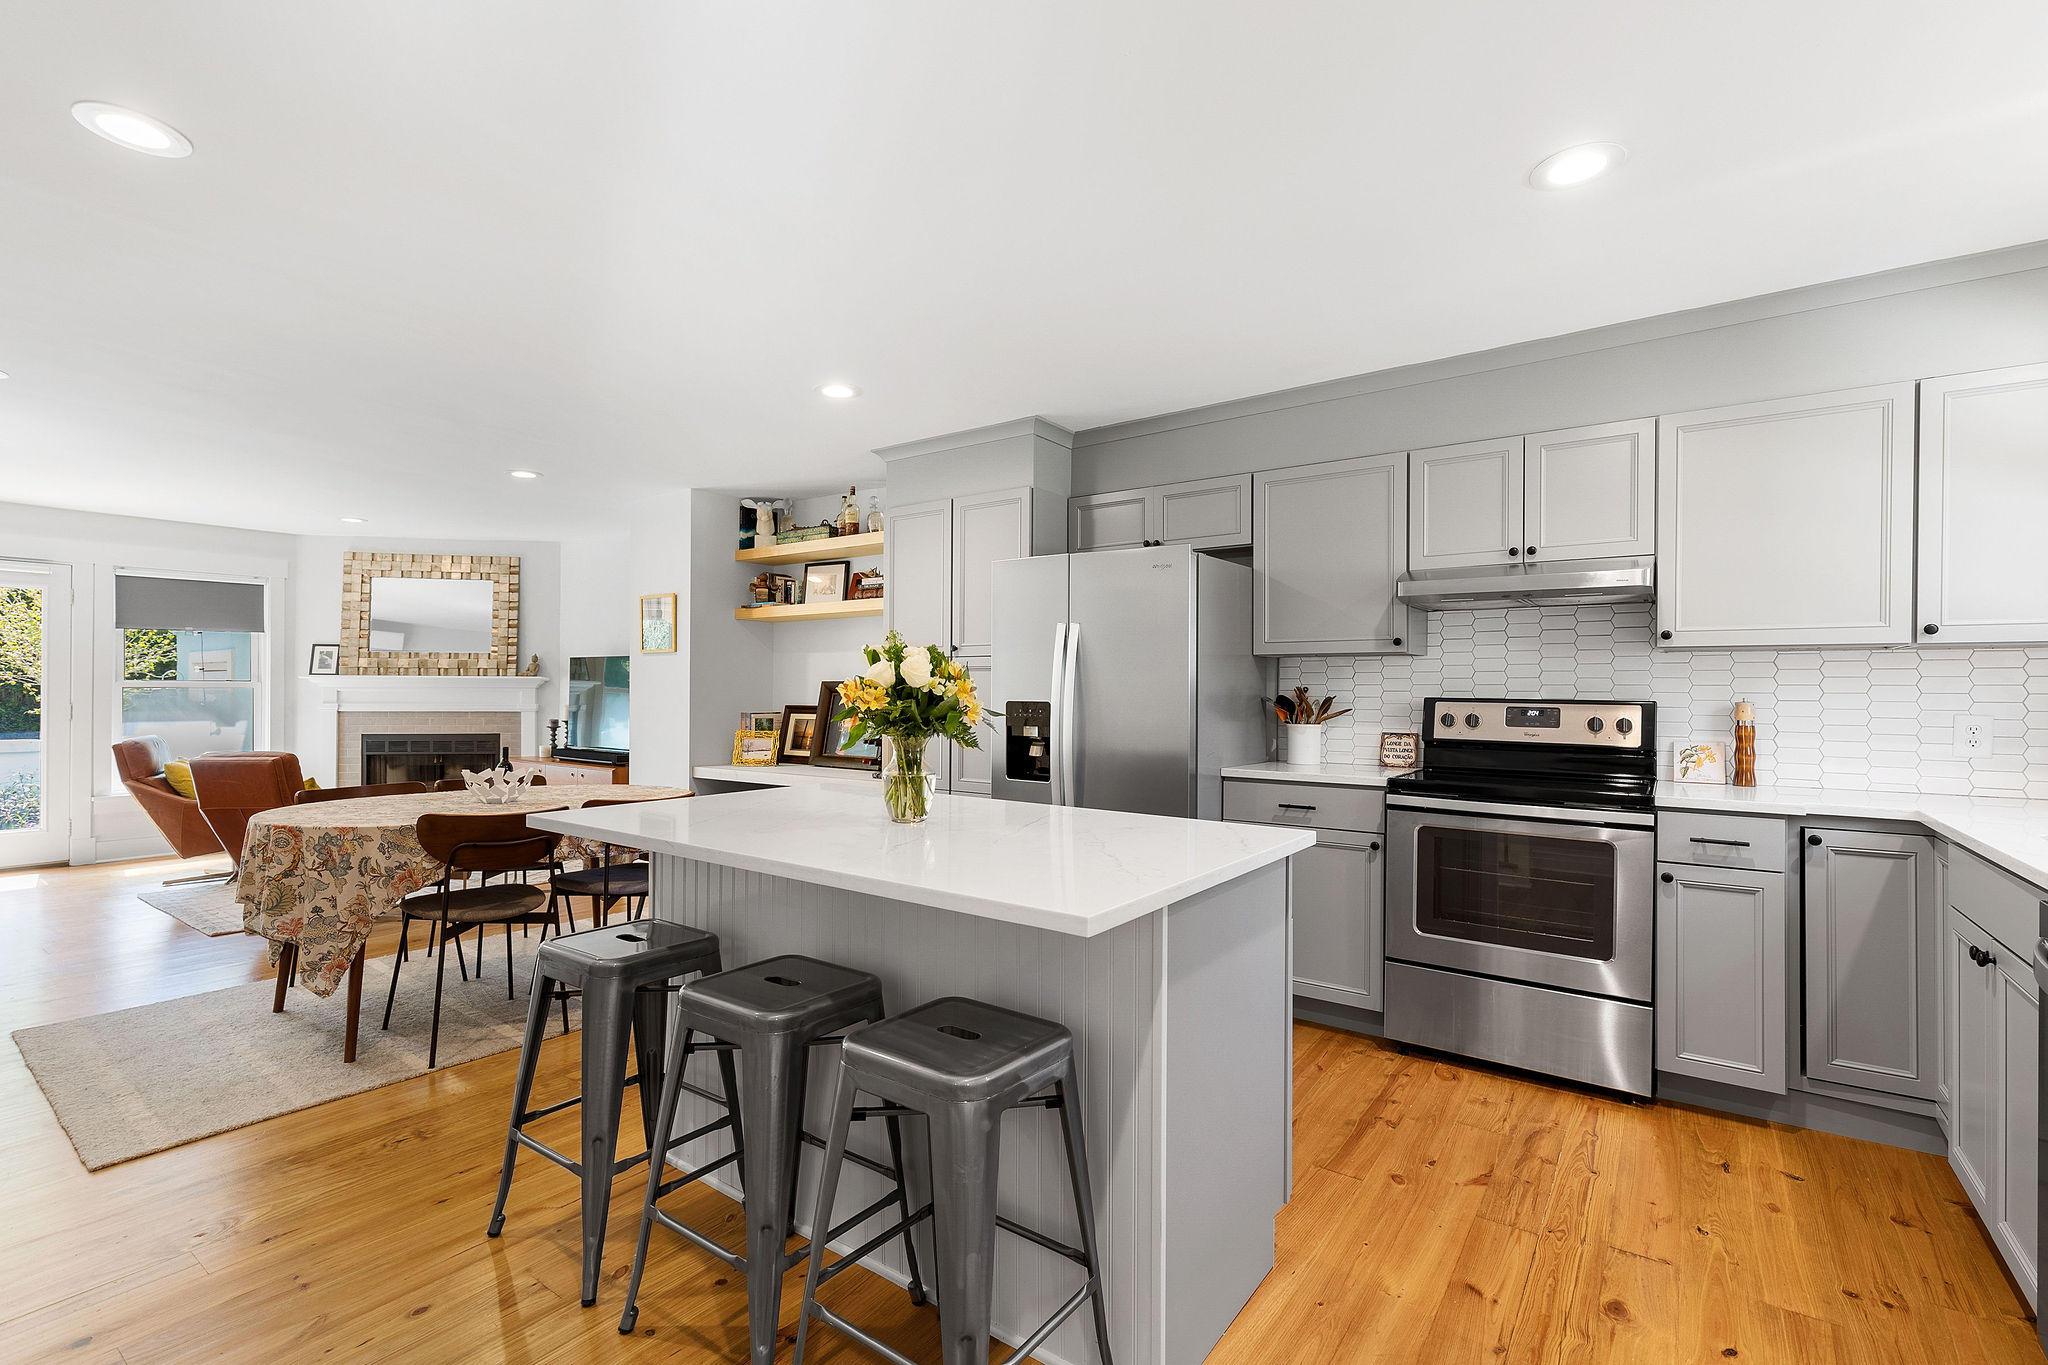 Proprietors Row Homes For Sale - 824 Colony, Charleston, SC - 16